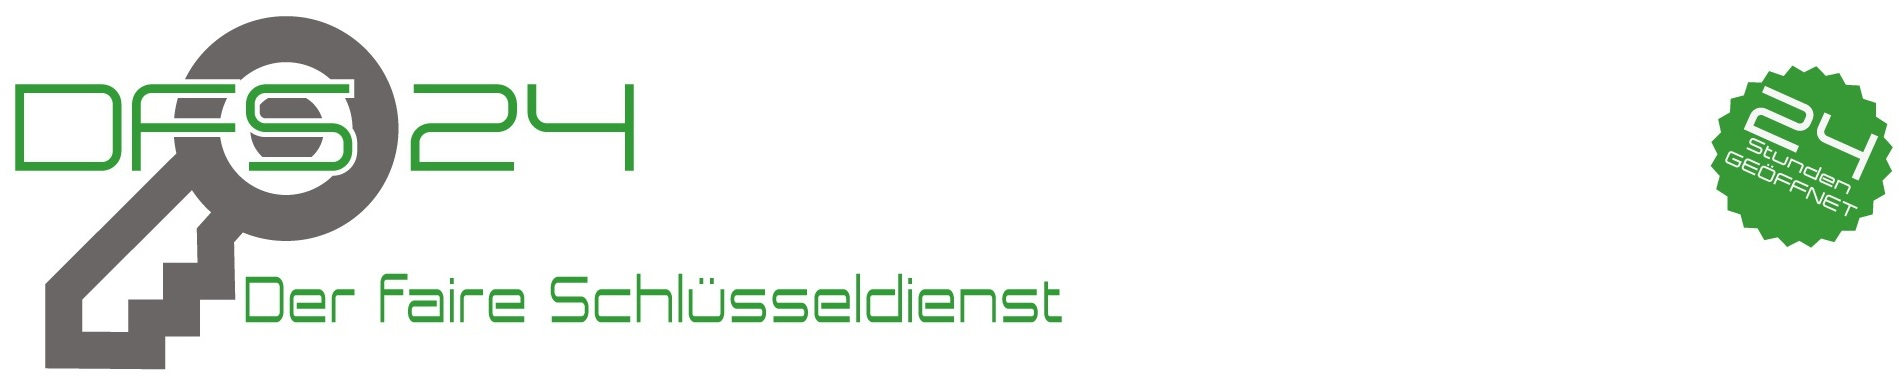 schlüsseldienst coesfeld logo